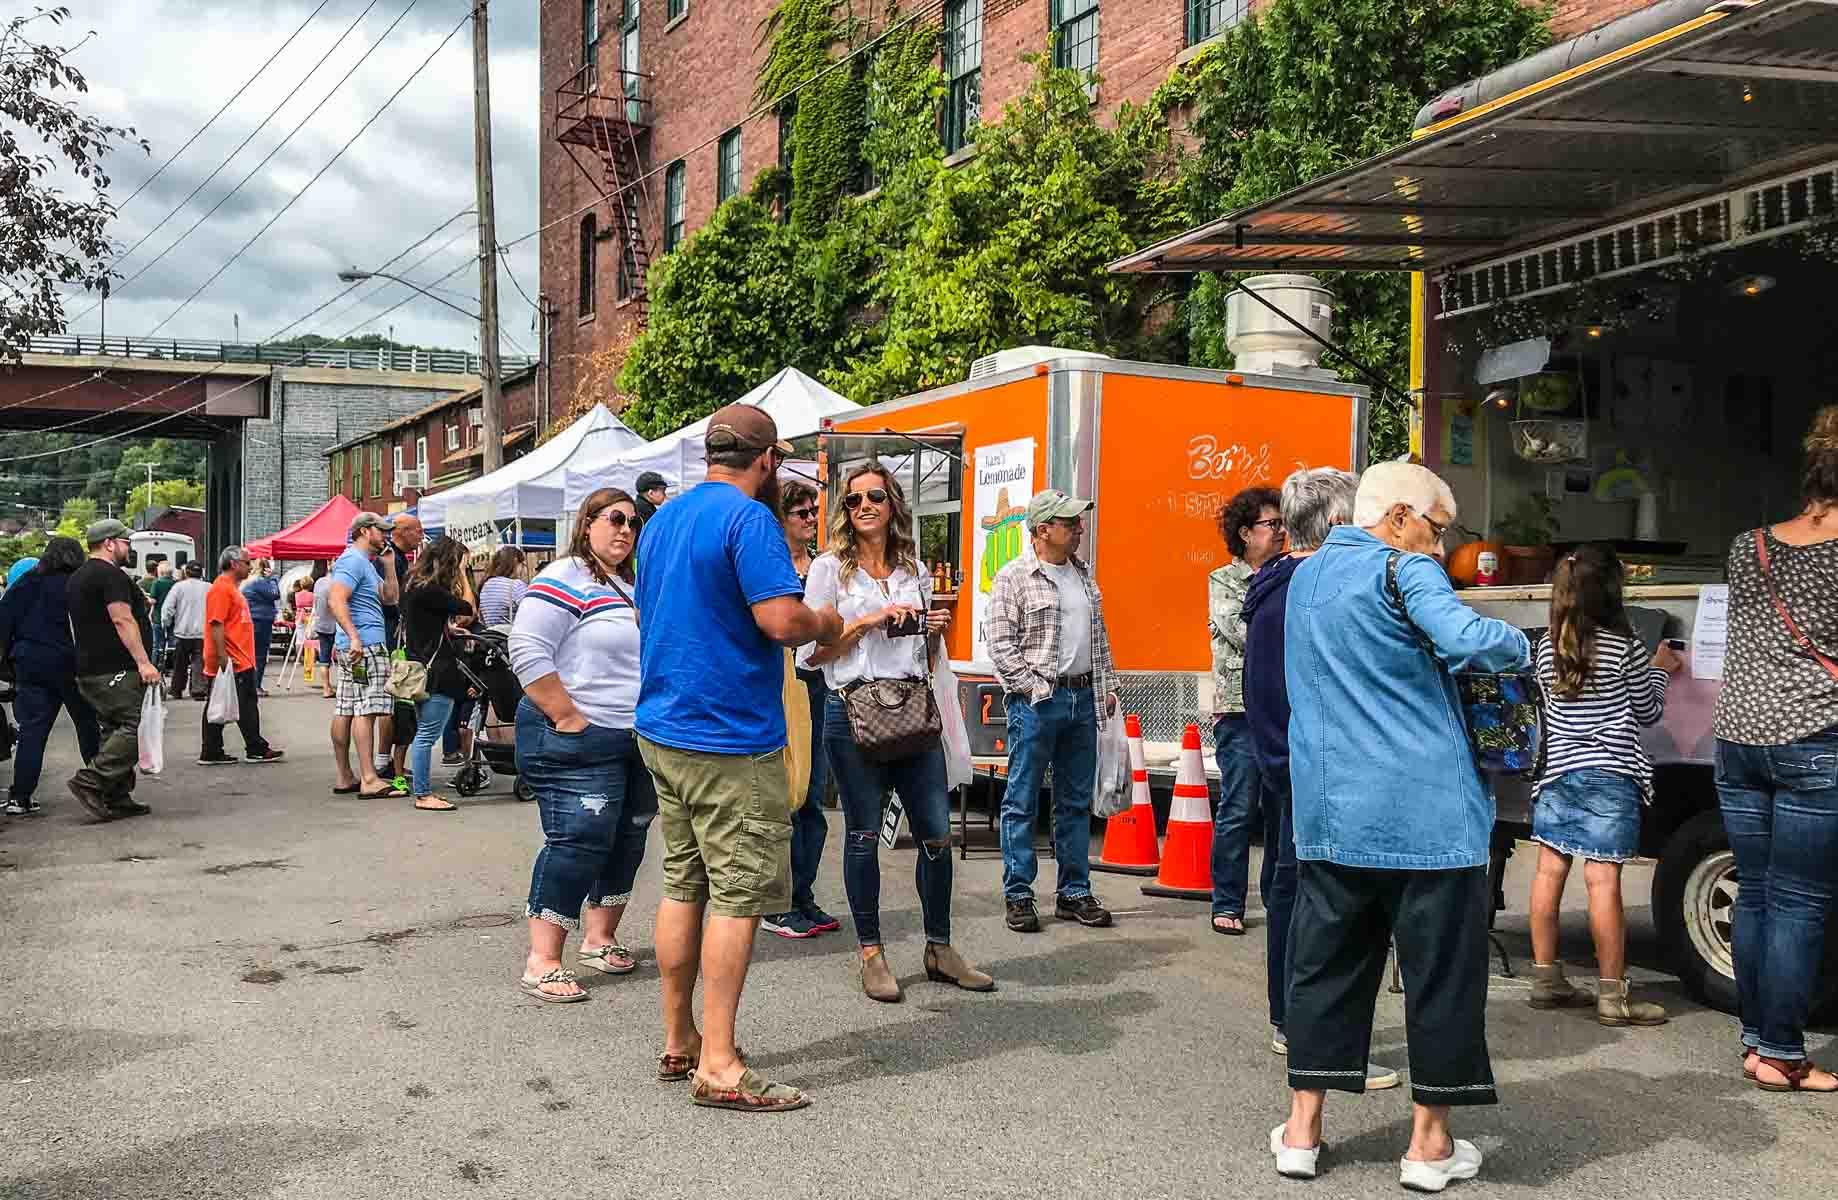 Mohawk Valley Garlic Festival Little Falls NY | Mohawk Valley Today